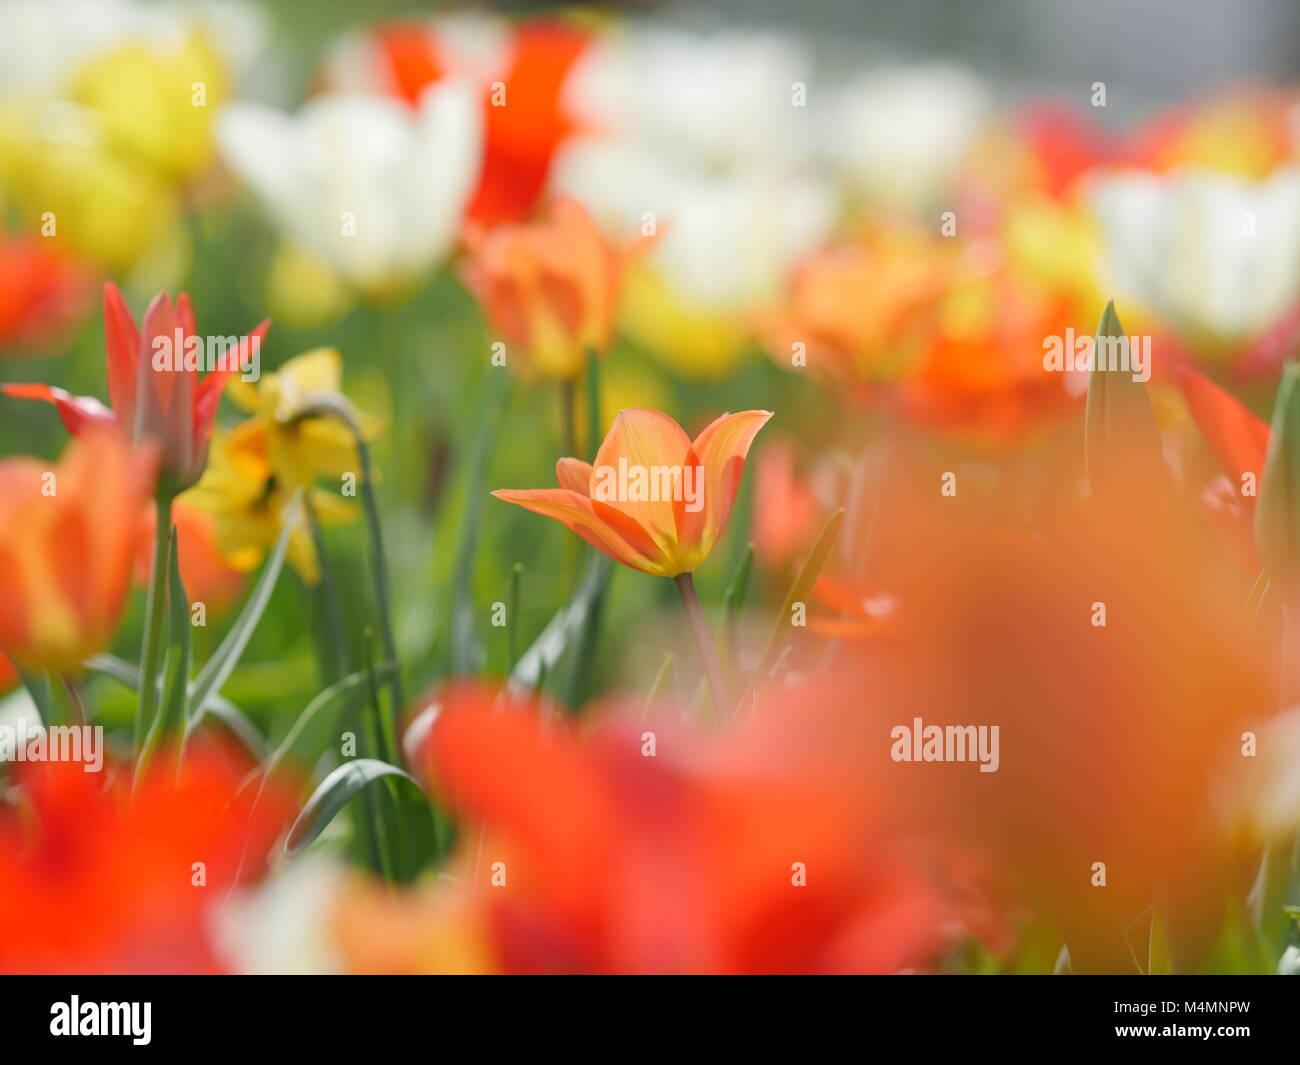 Macro of bright flowers - Stock Image